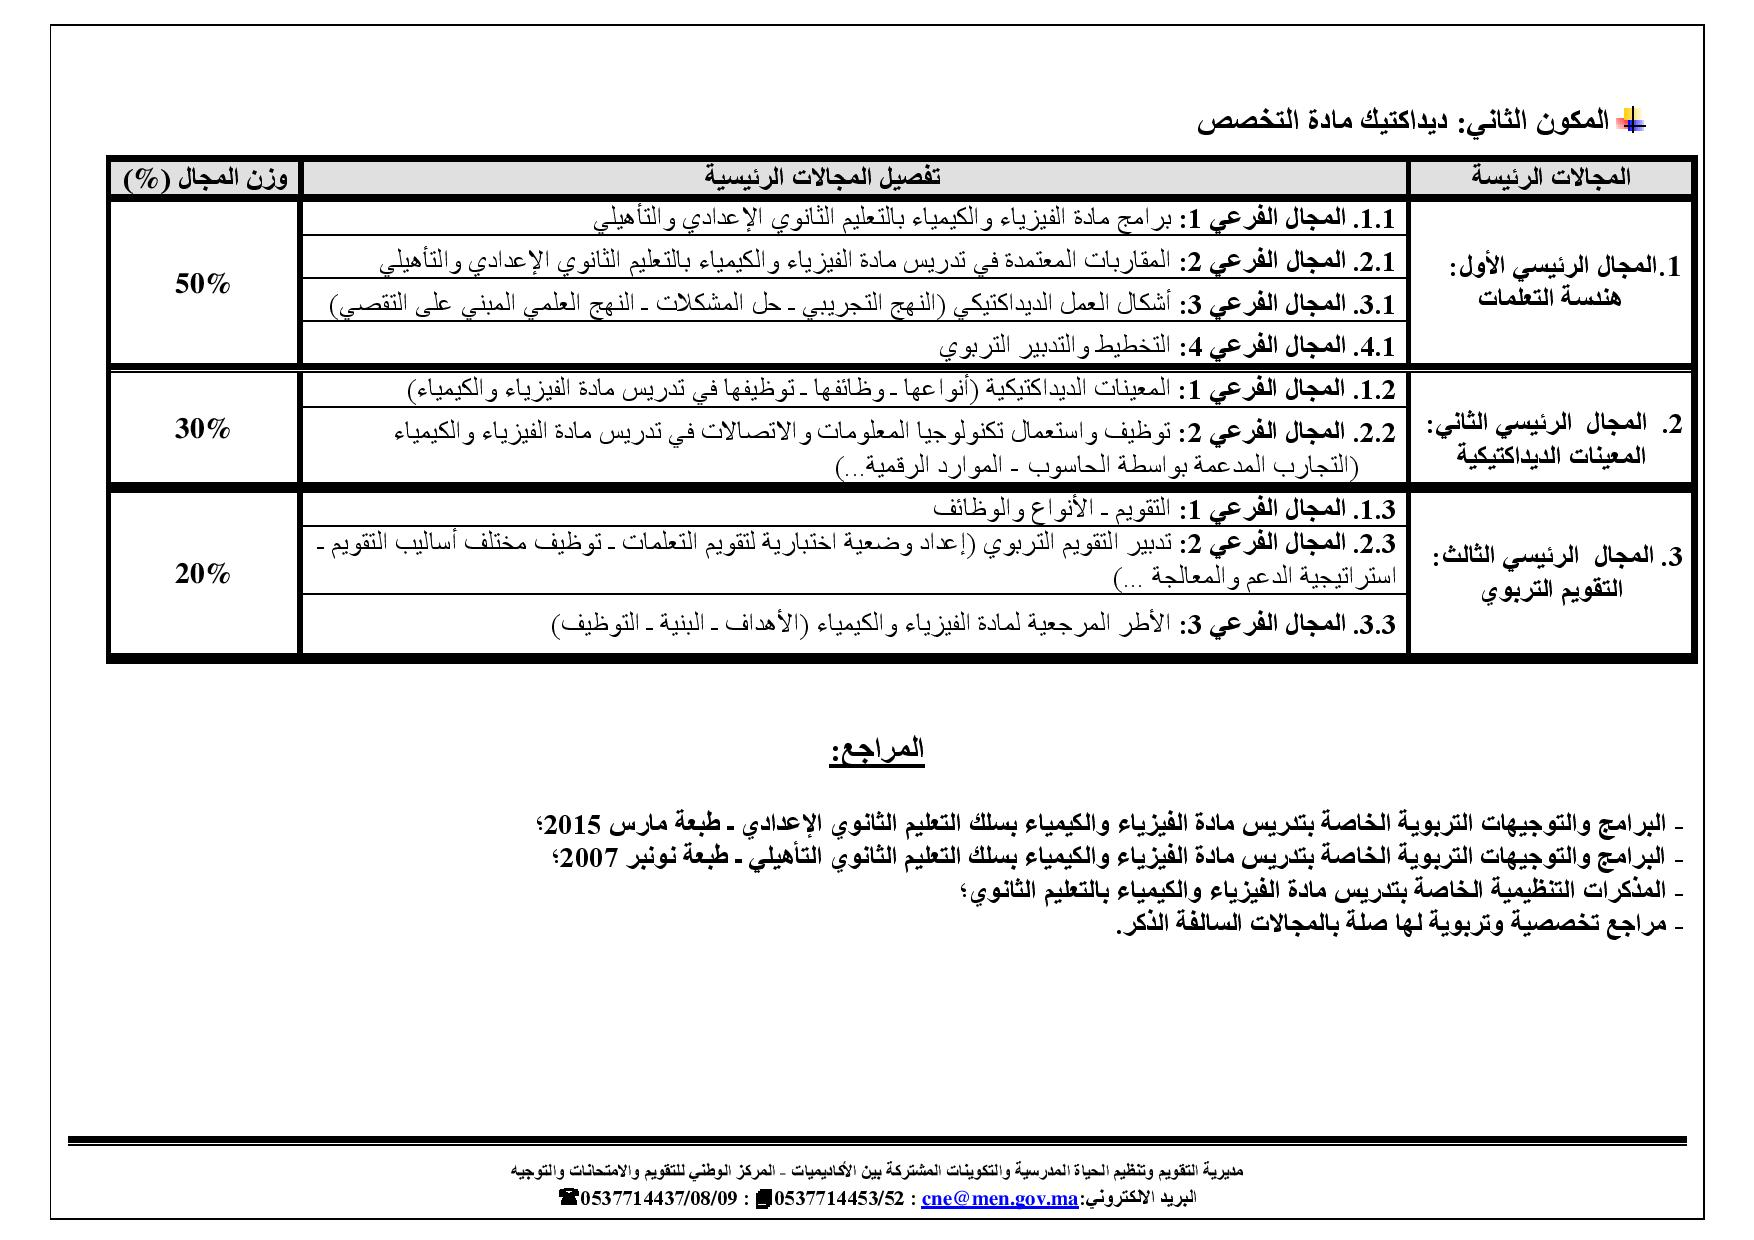 Document page 002 4 - اختبار الفيزياء والكيمياء ثانوي لمباراة التعاقد للتوظيف بالمدرسة المغربية